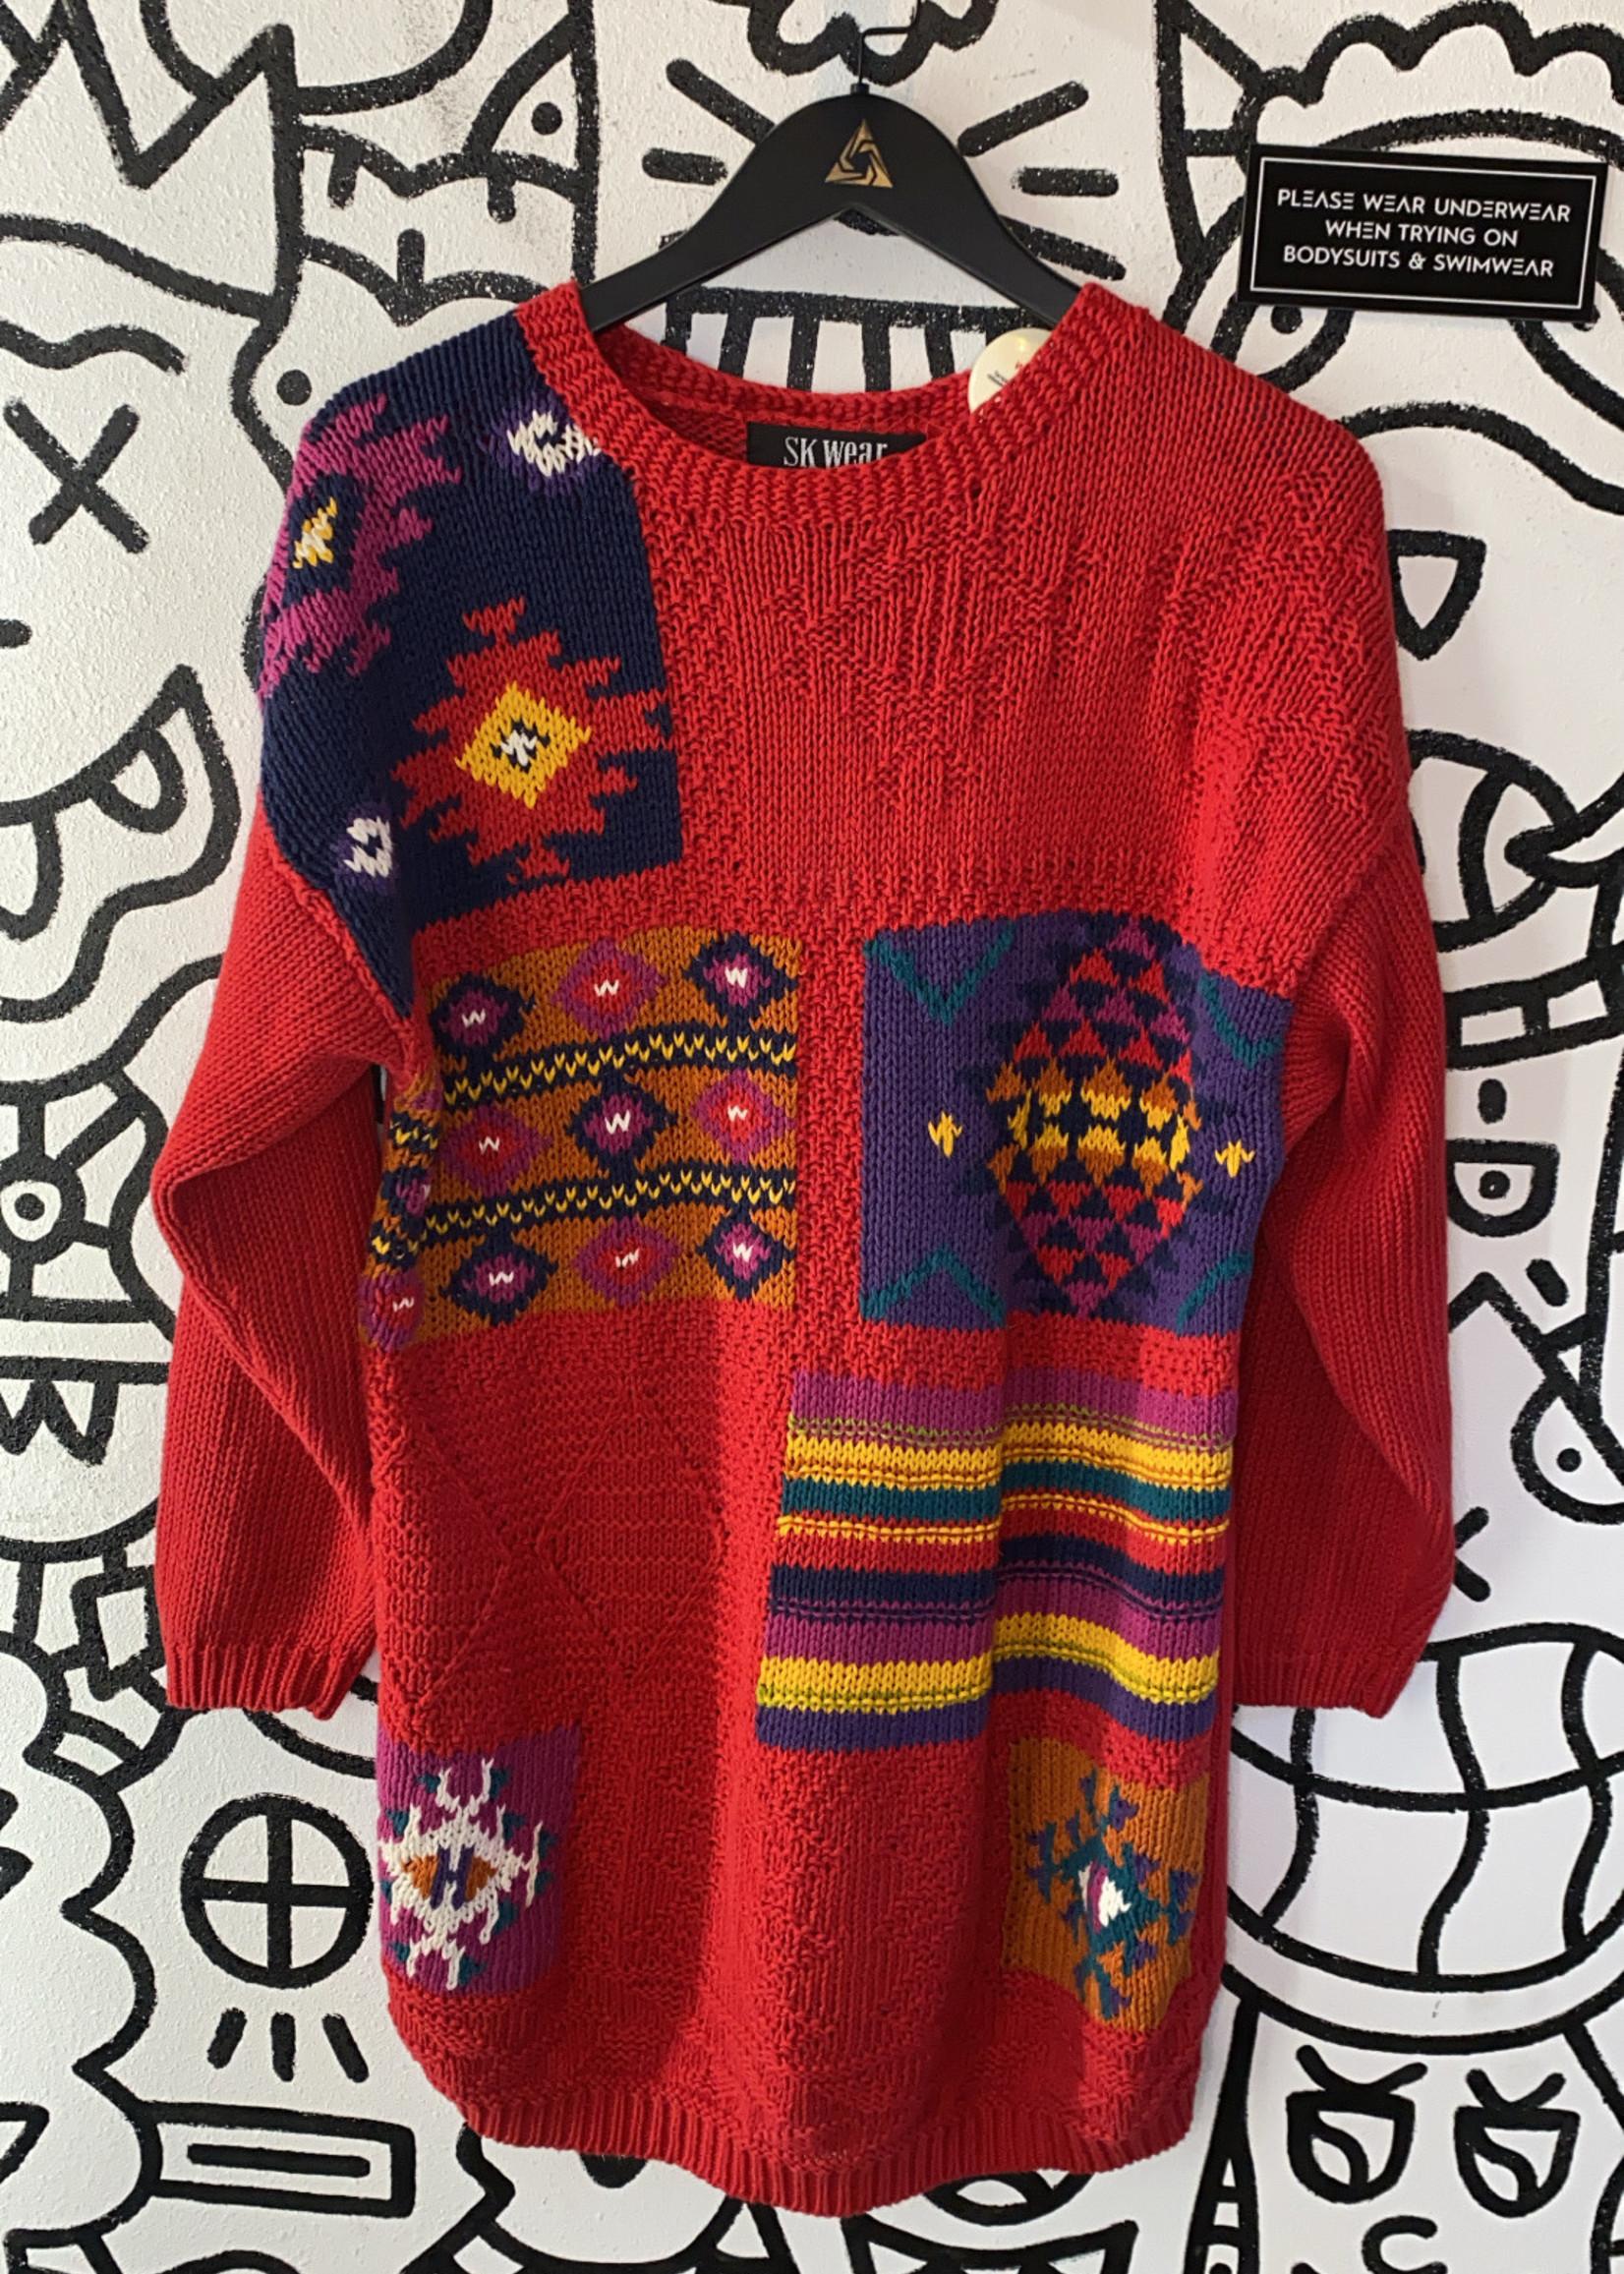 Sk Wear Vintage Red Long Sweater S